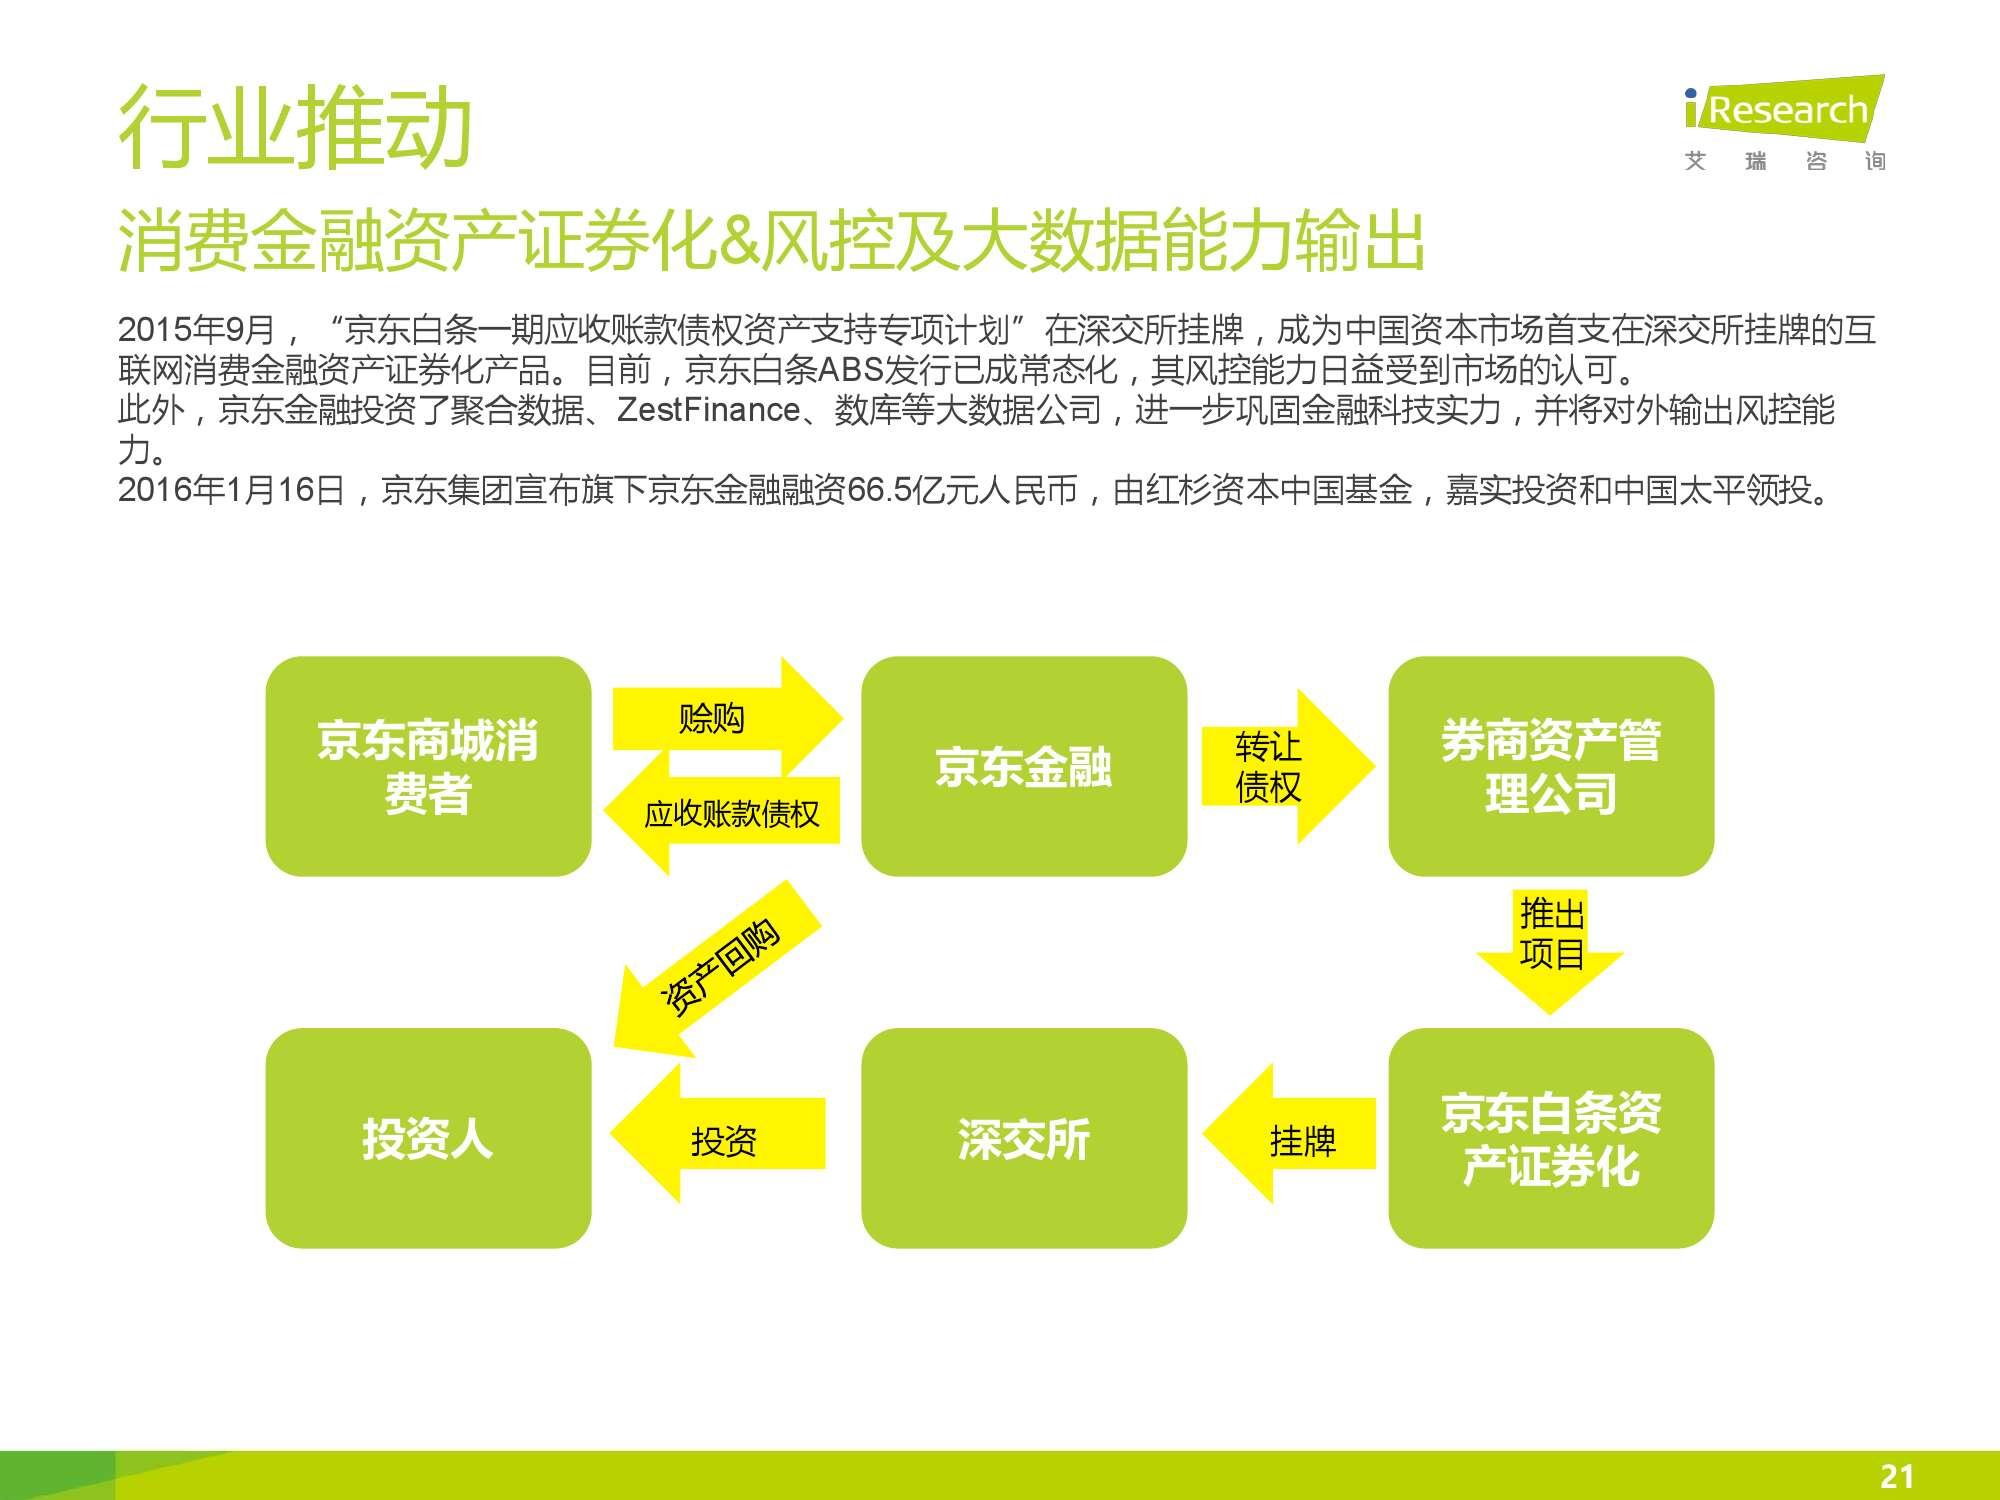 iResearch-2016年中国互联网消费金融市场研究报告_000021